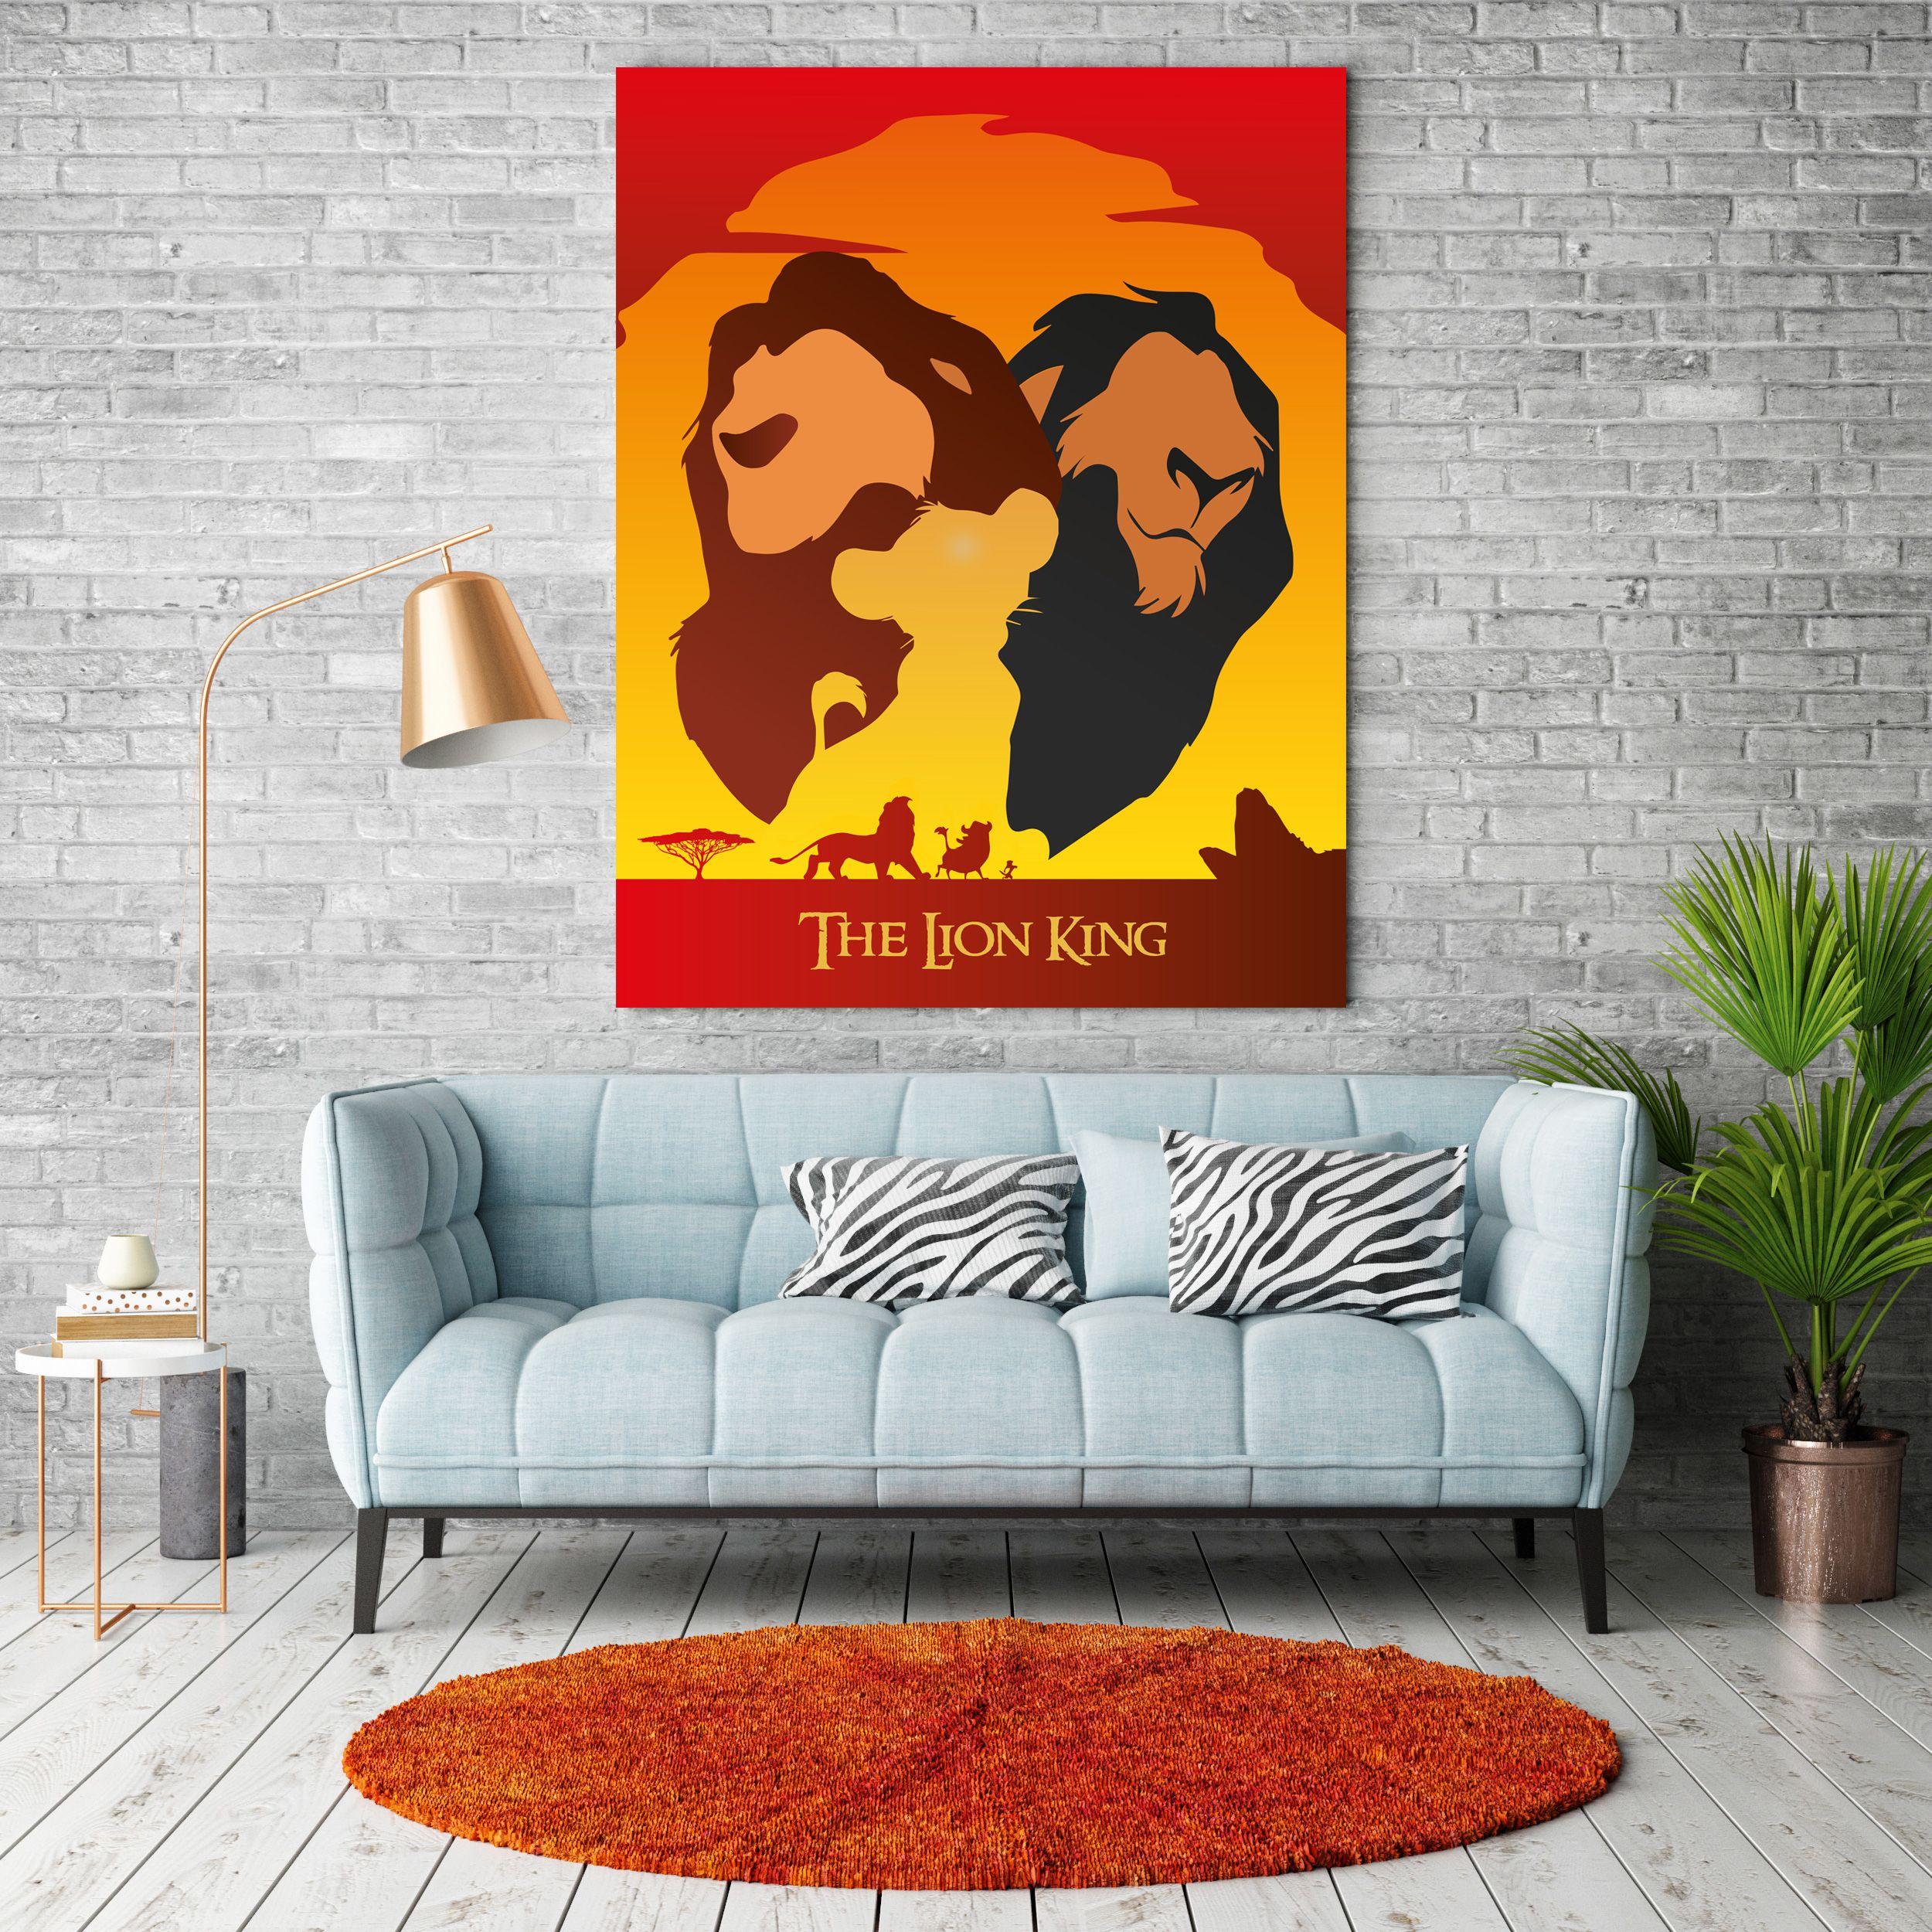 The Lion King Alternative Movie Poster / Disney / Simba